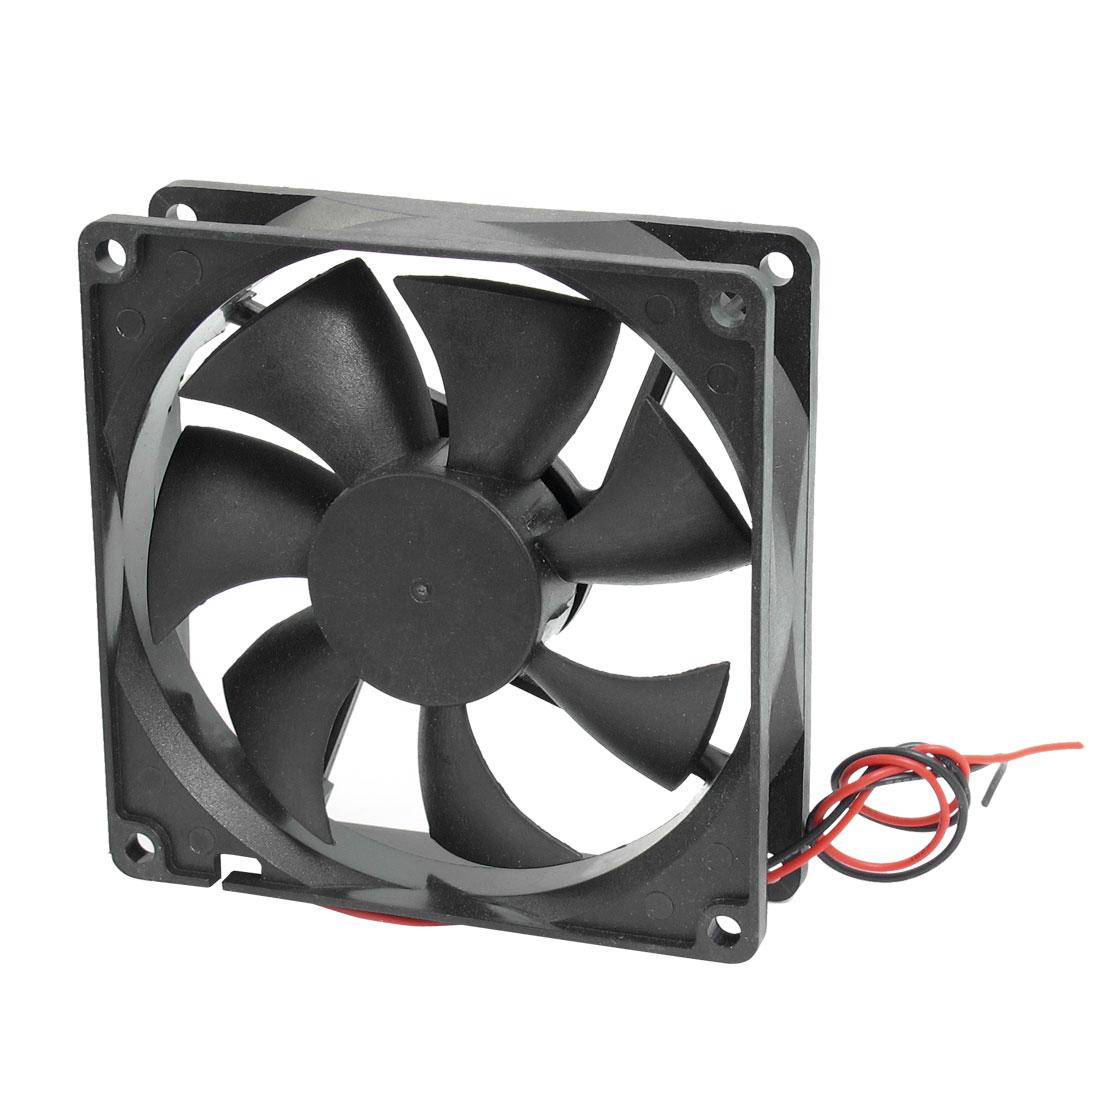 90mm x 90mm x 25mm Computer Case CPU Cooler DC Cooling Fan 12V 0.09A